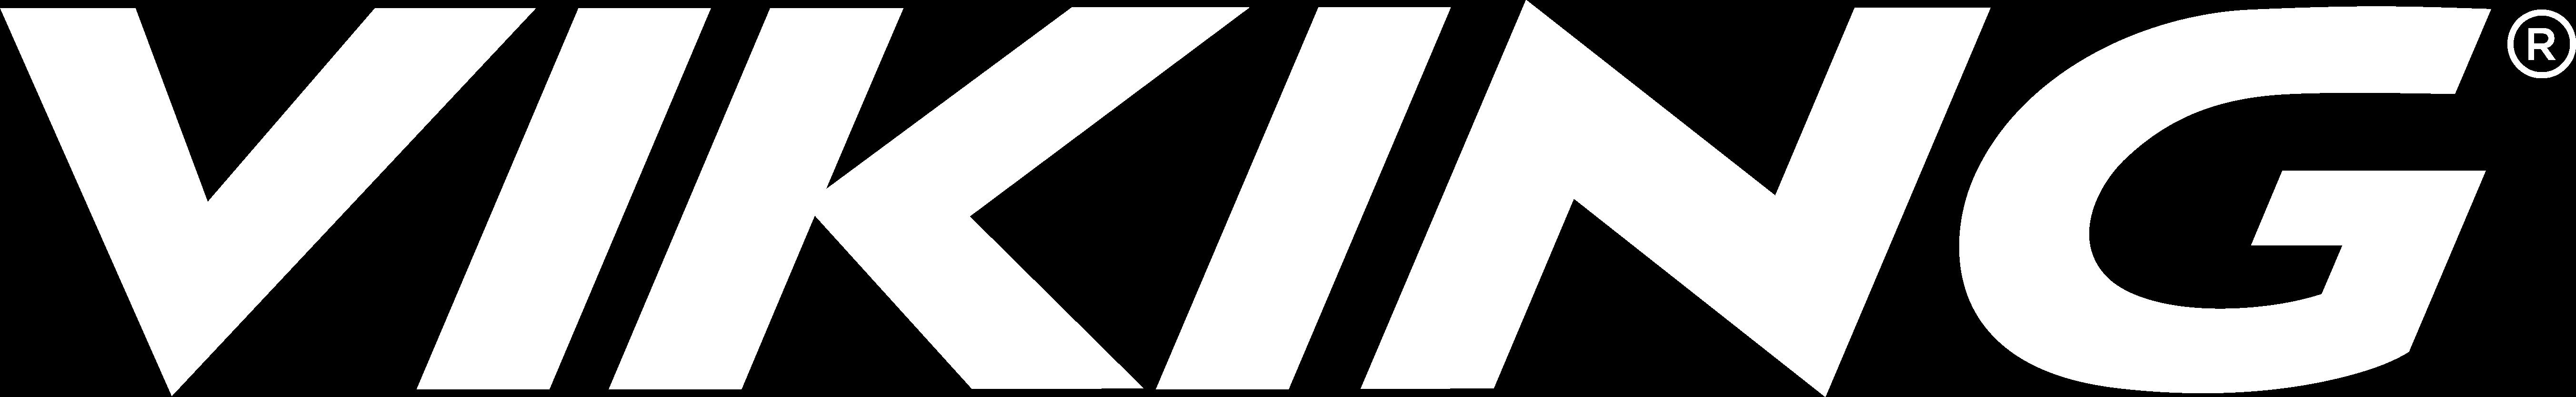 Viking_20_Logo_white